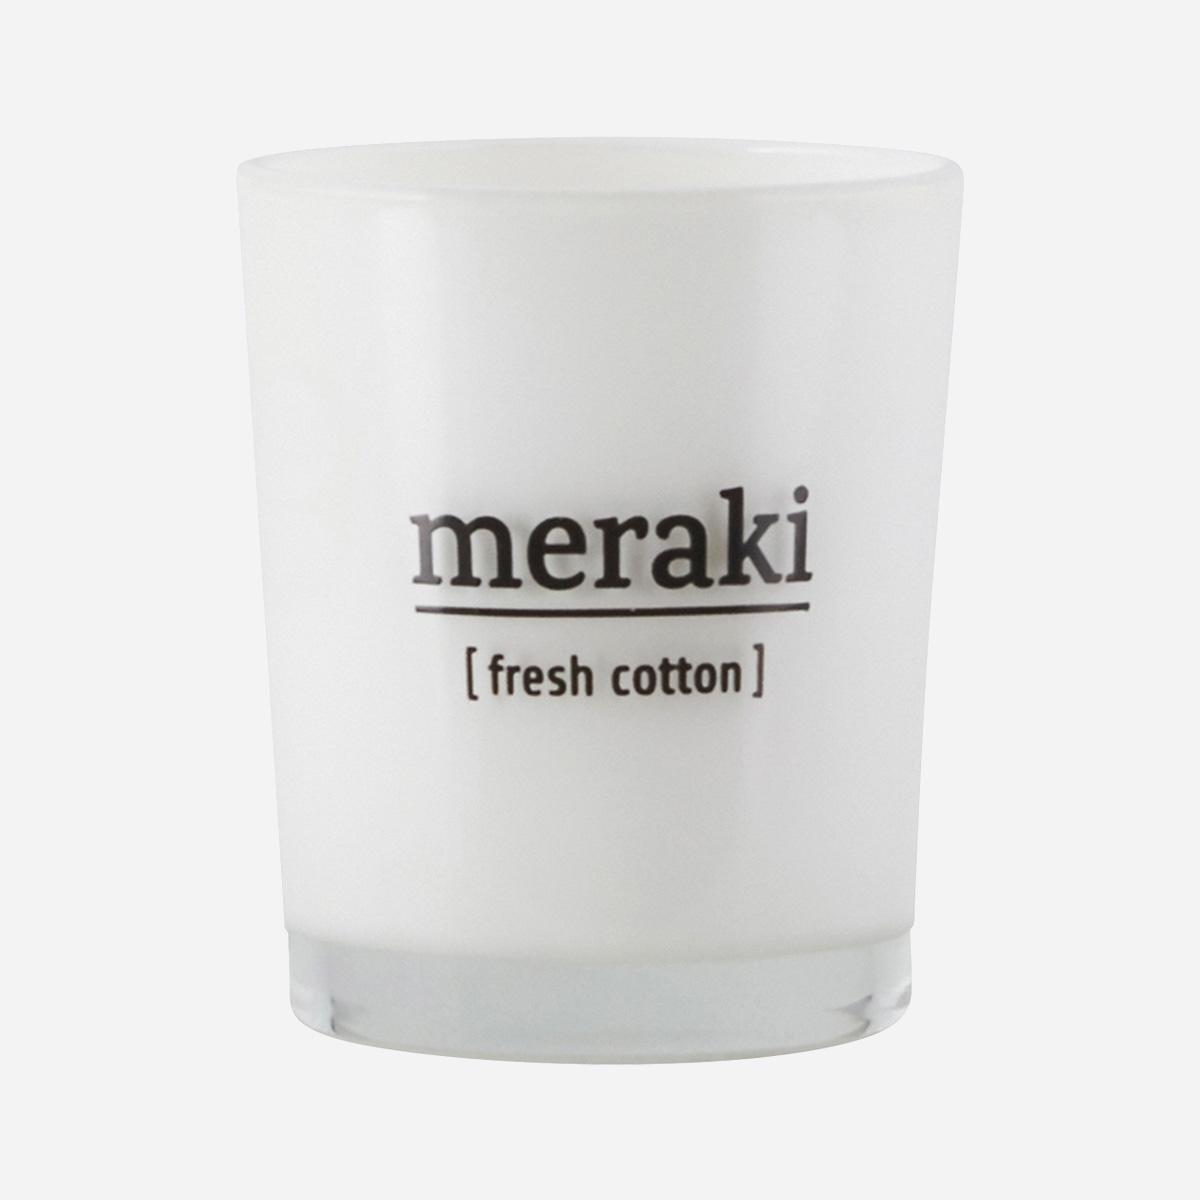 Meraki - Duftlys, fresh cotton, 60g